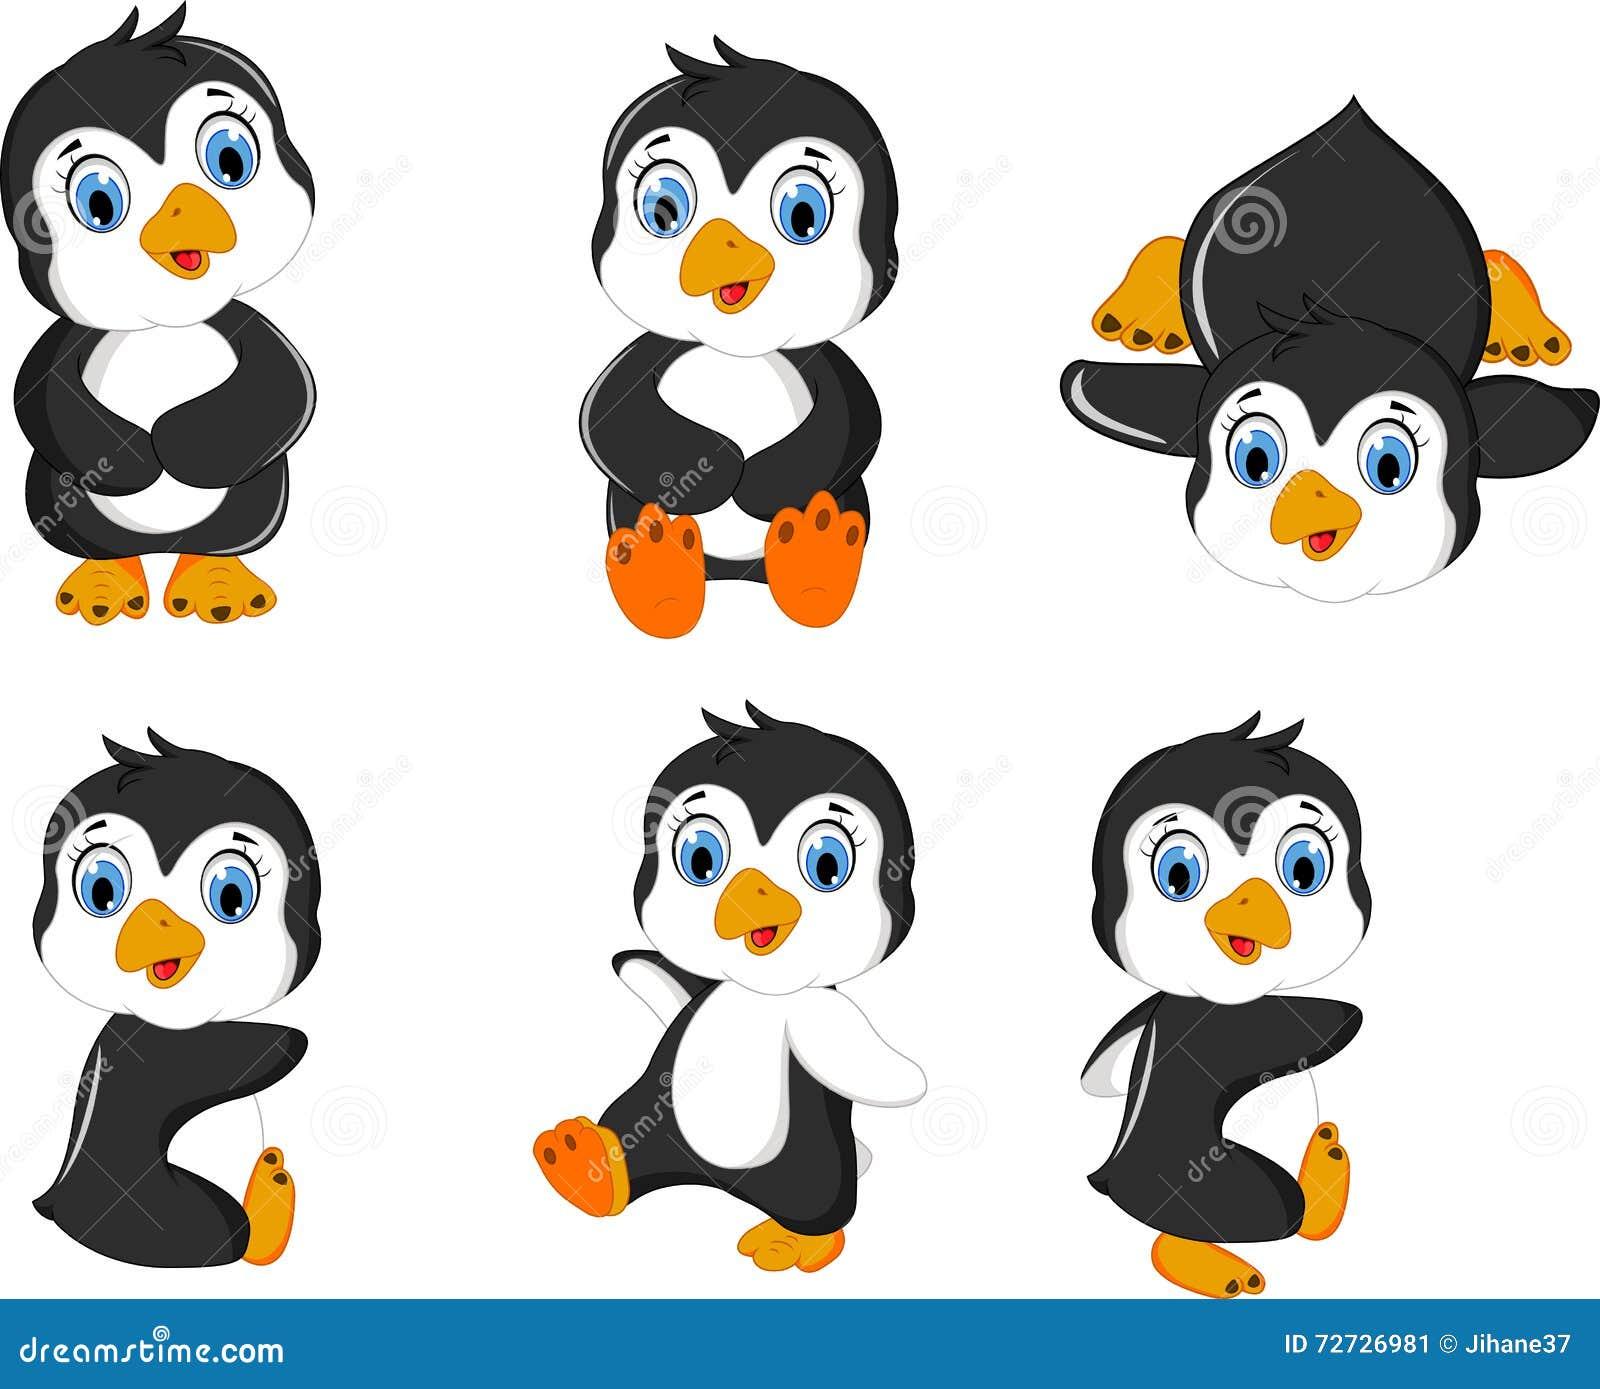 Cute Cartoon Baby Penguins | www.pixshark.com - Images ...